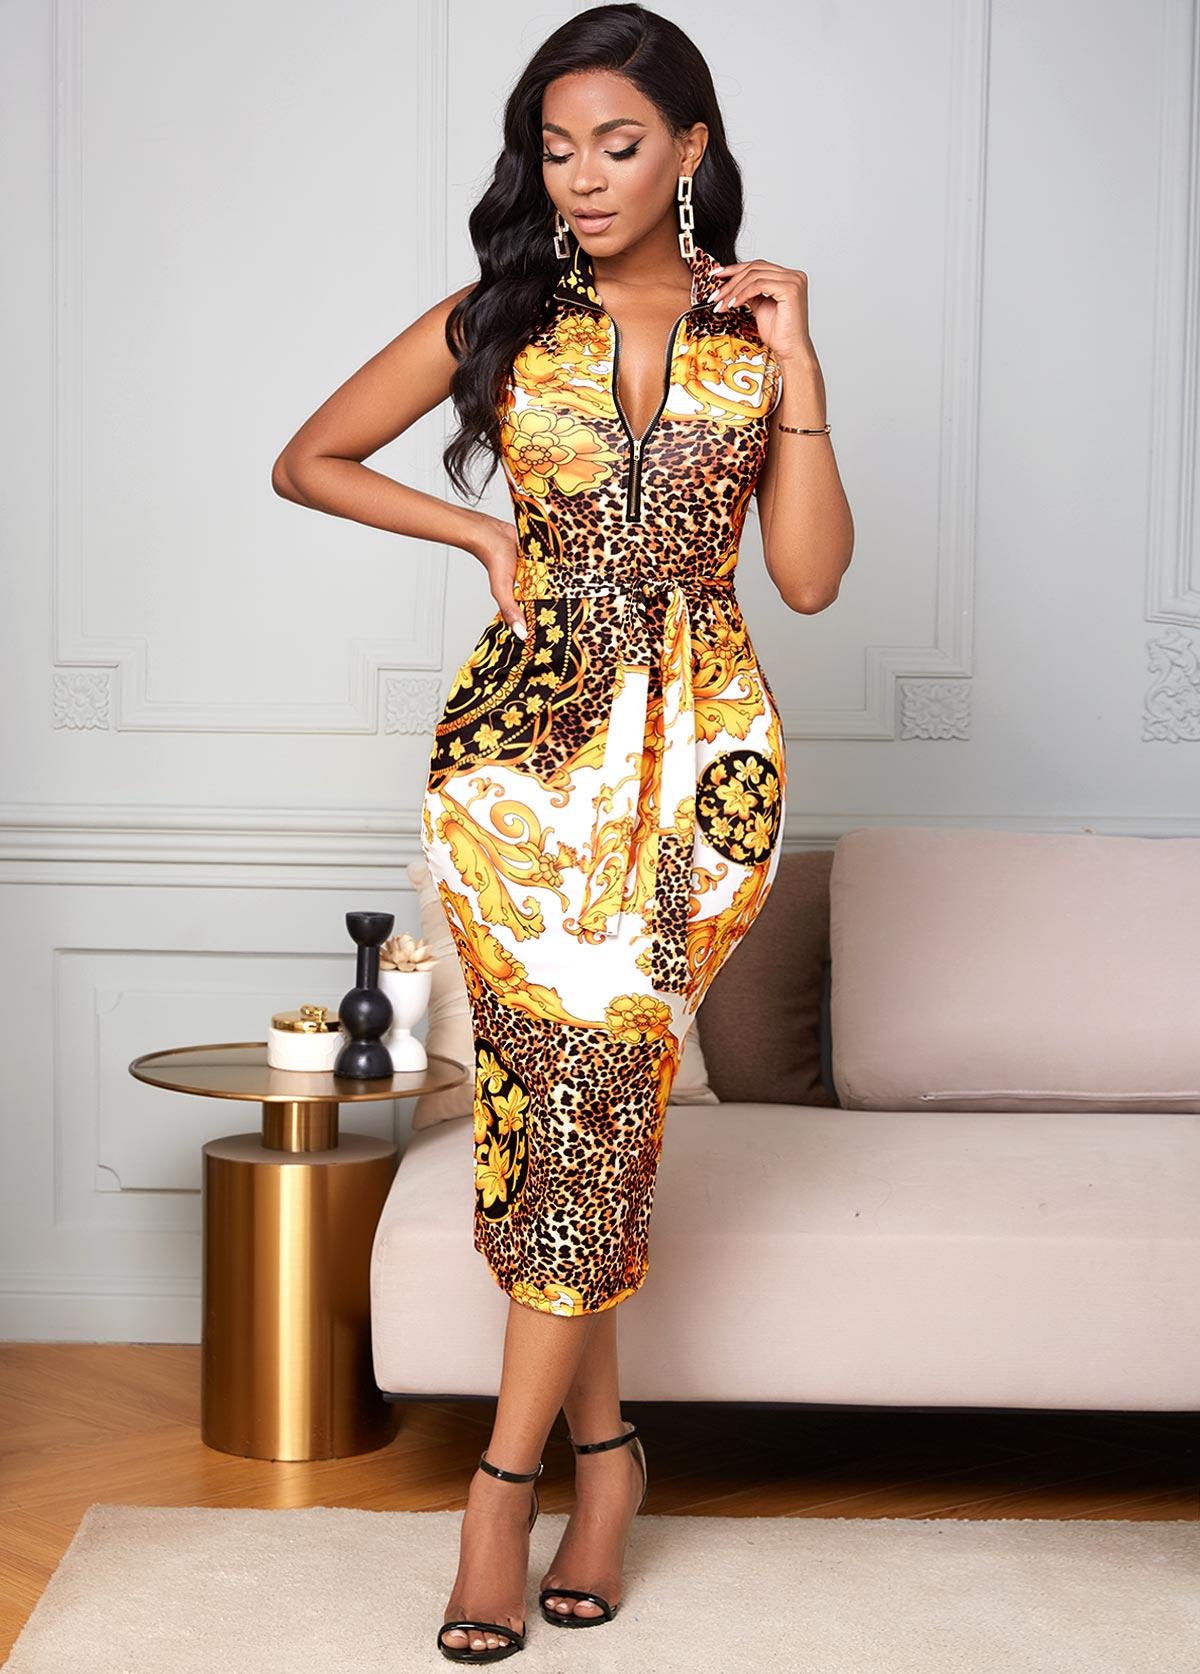 Baroque Print Sleeveless Zipper Detail Bodycon Dress